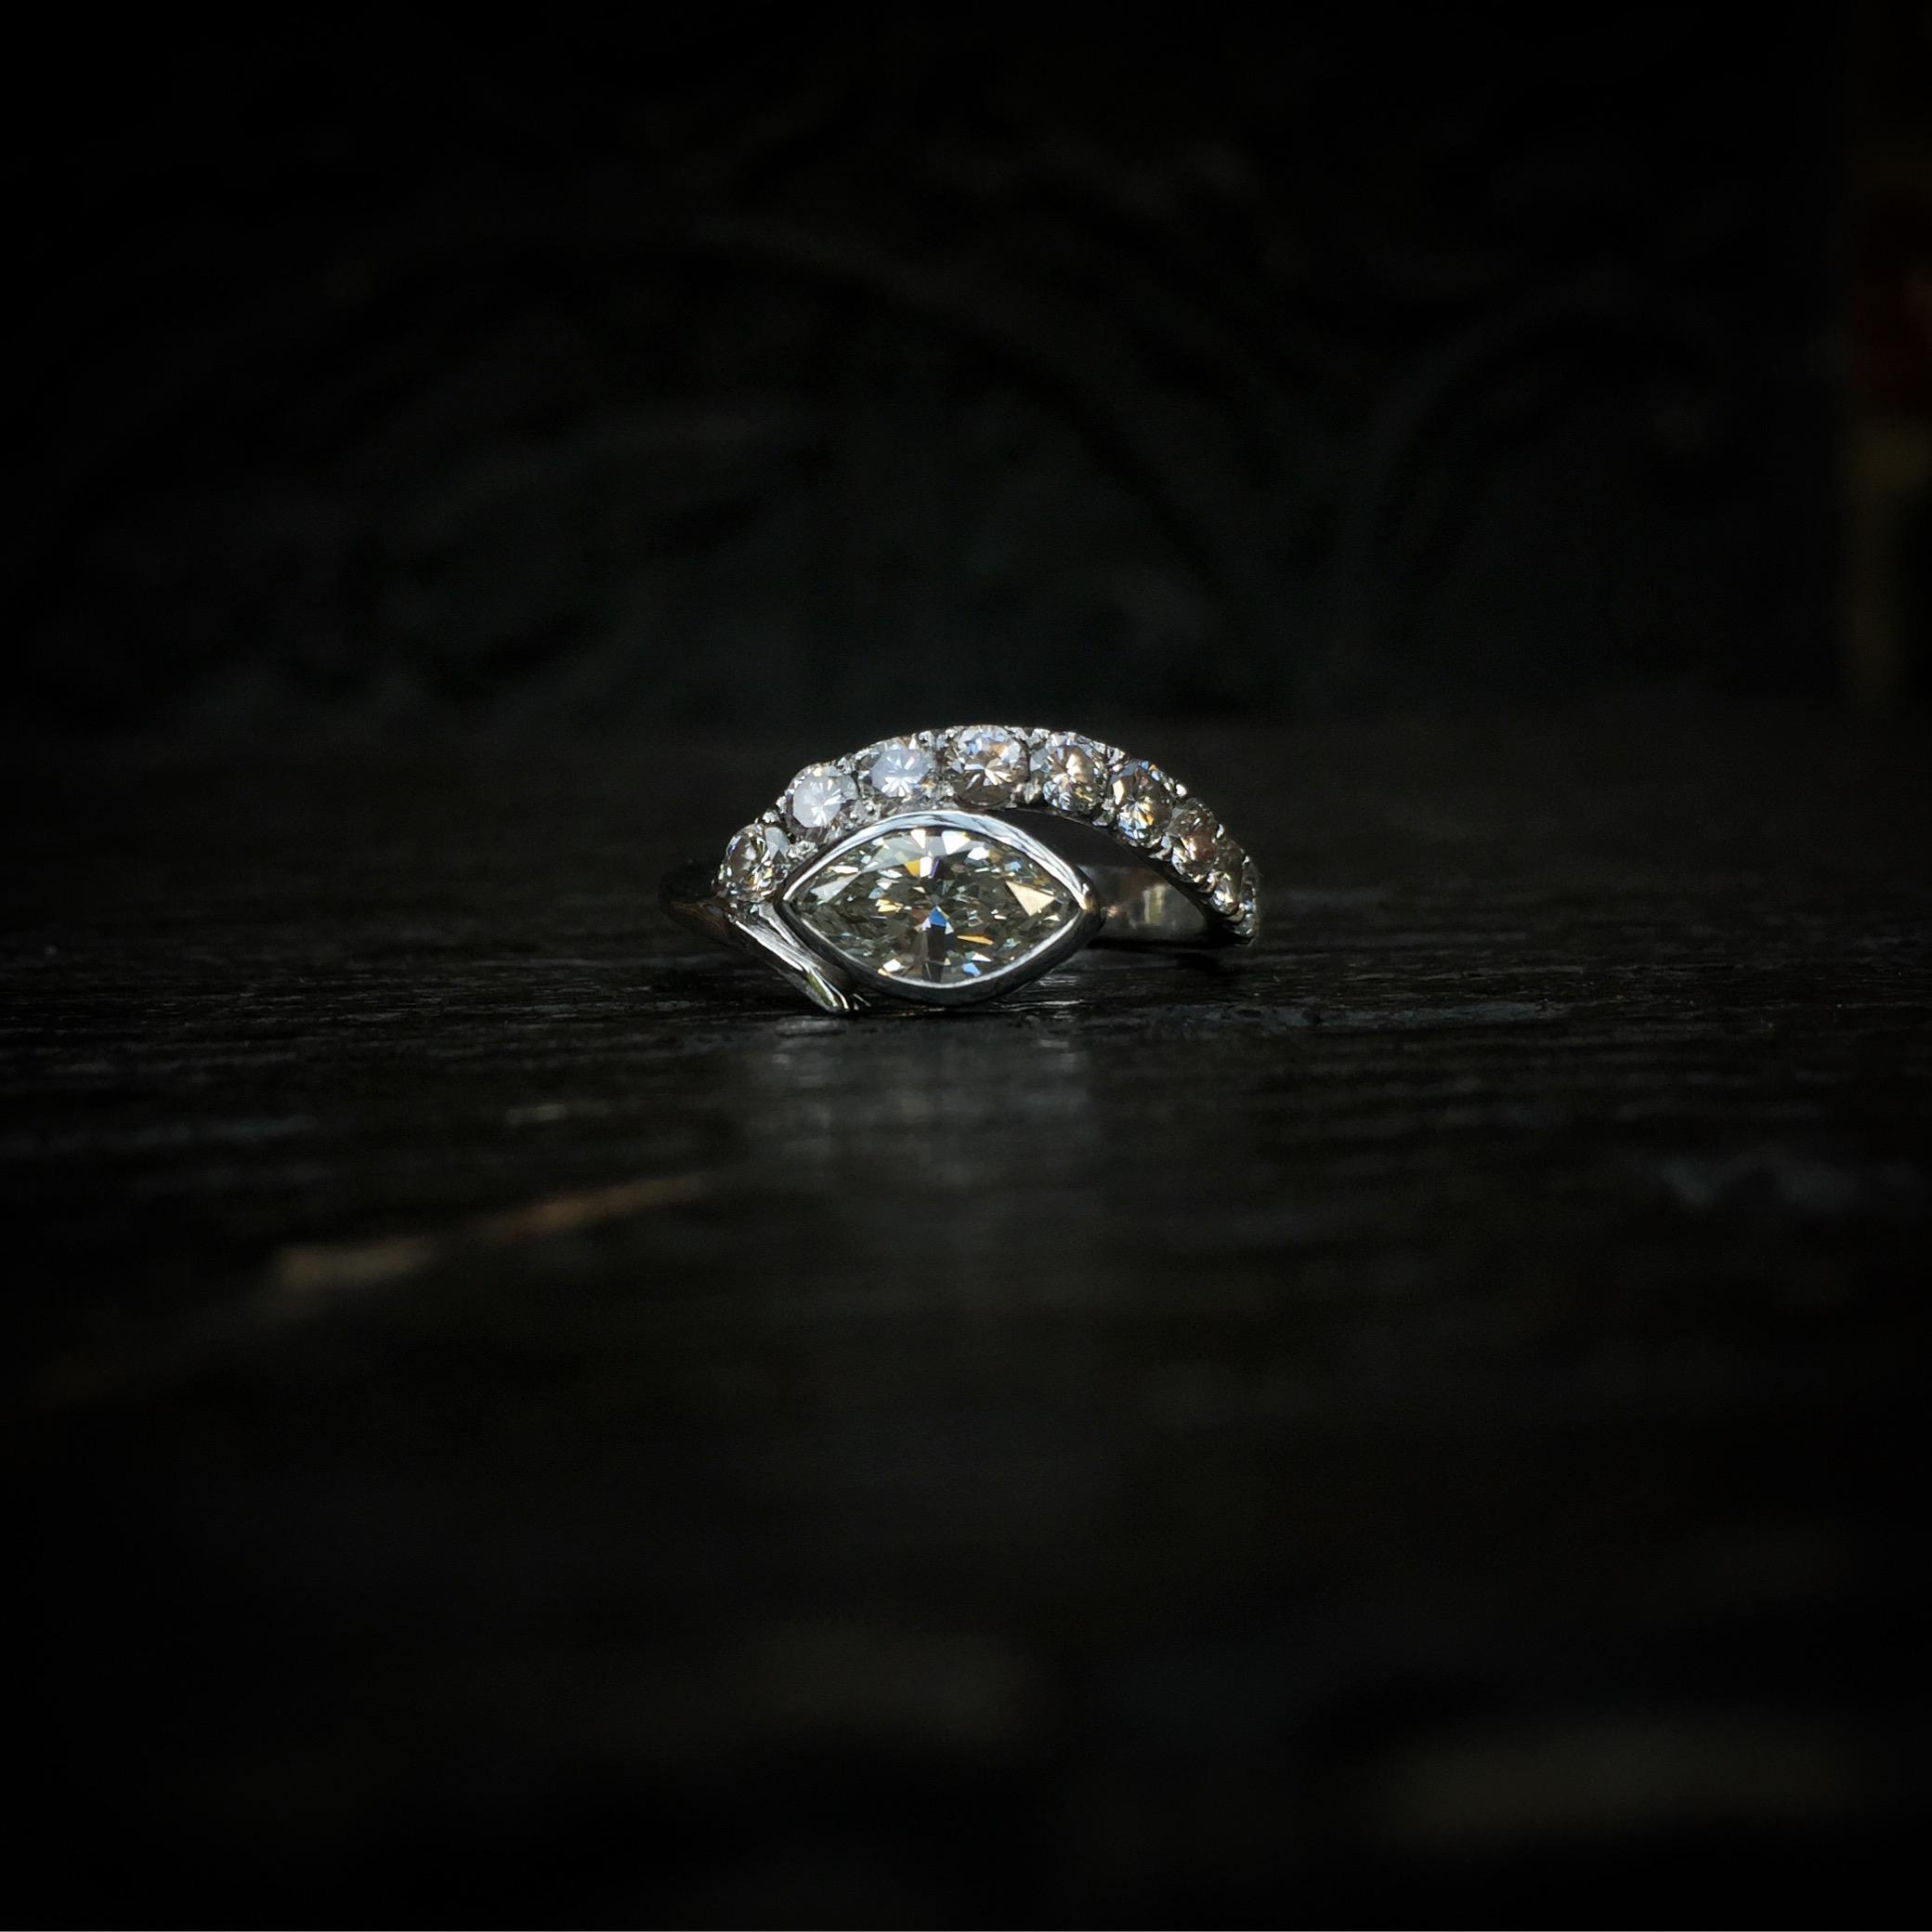 Bague Oeil Diamant Arthabilis.